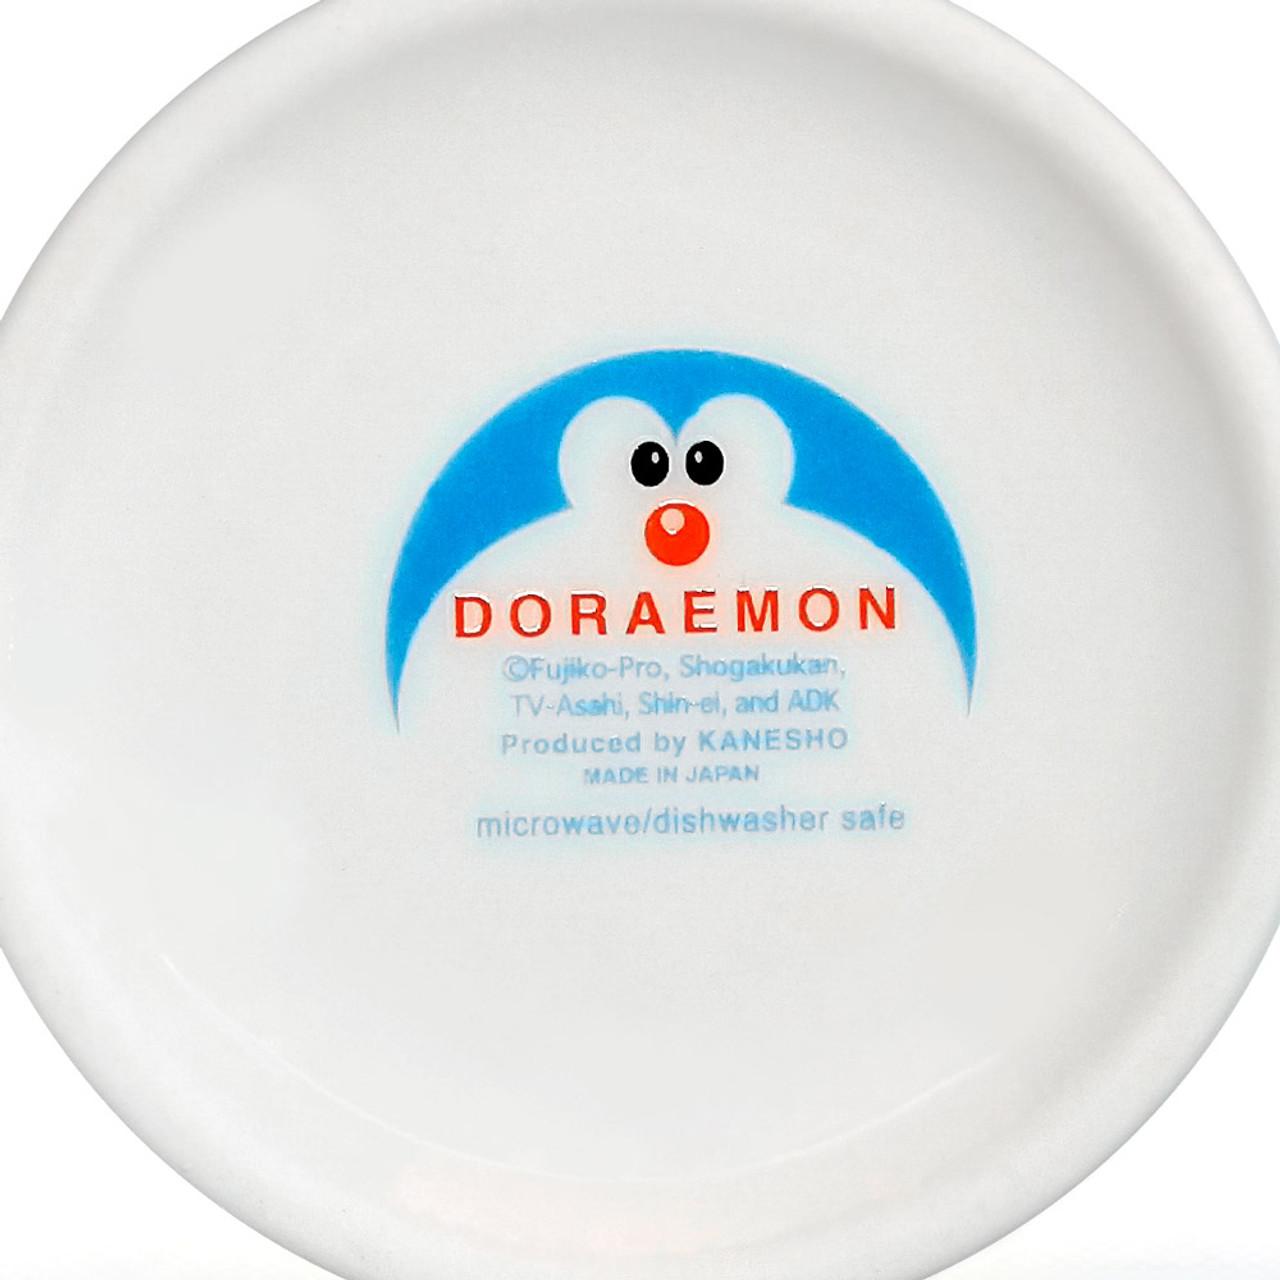 Japan Doraemon Face Porcelain Coffee Mug - Doraemon ( Bottom View )